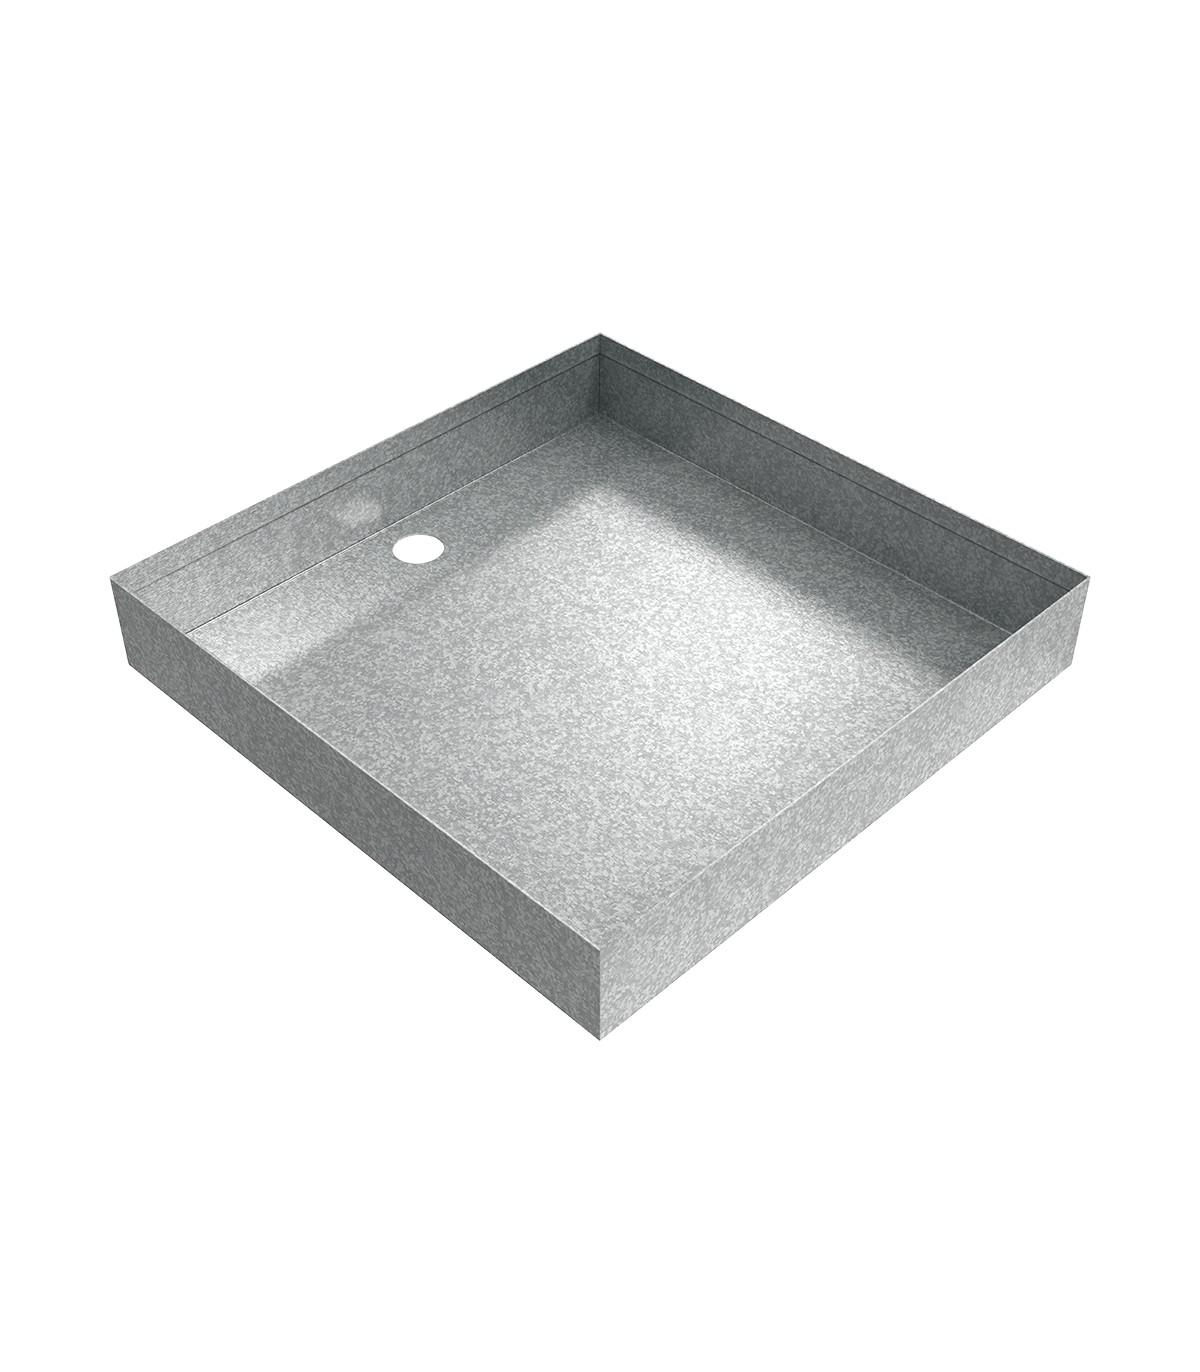 Galvanized Drain Pan 12 X 12